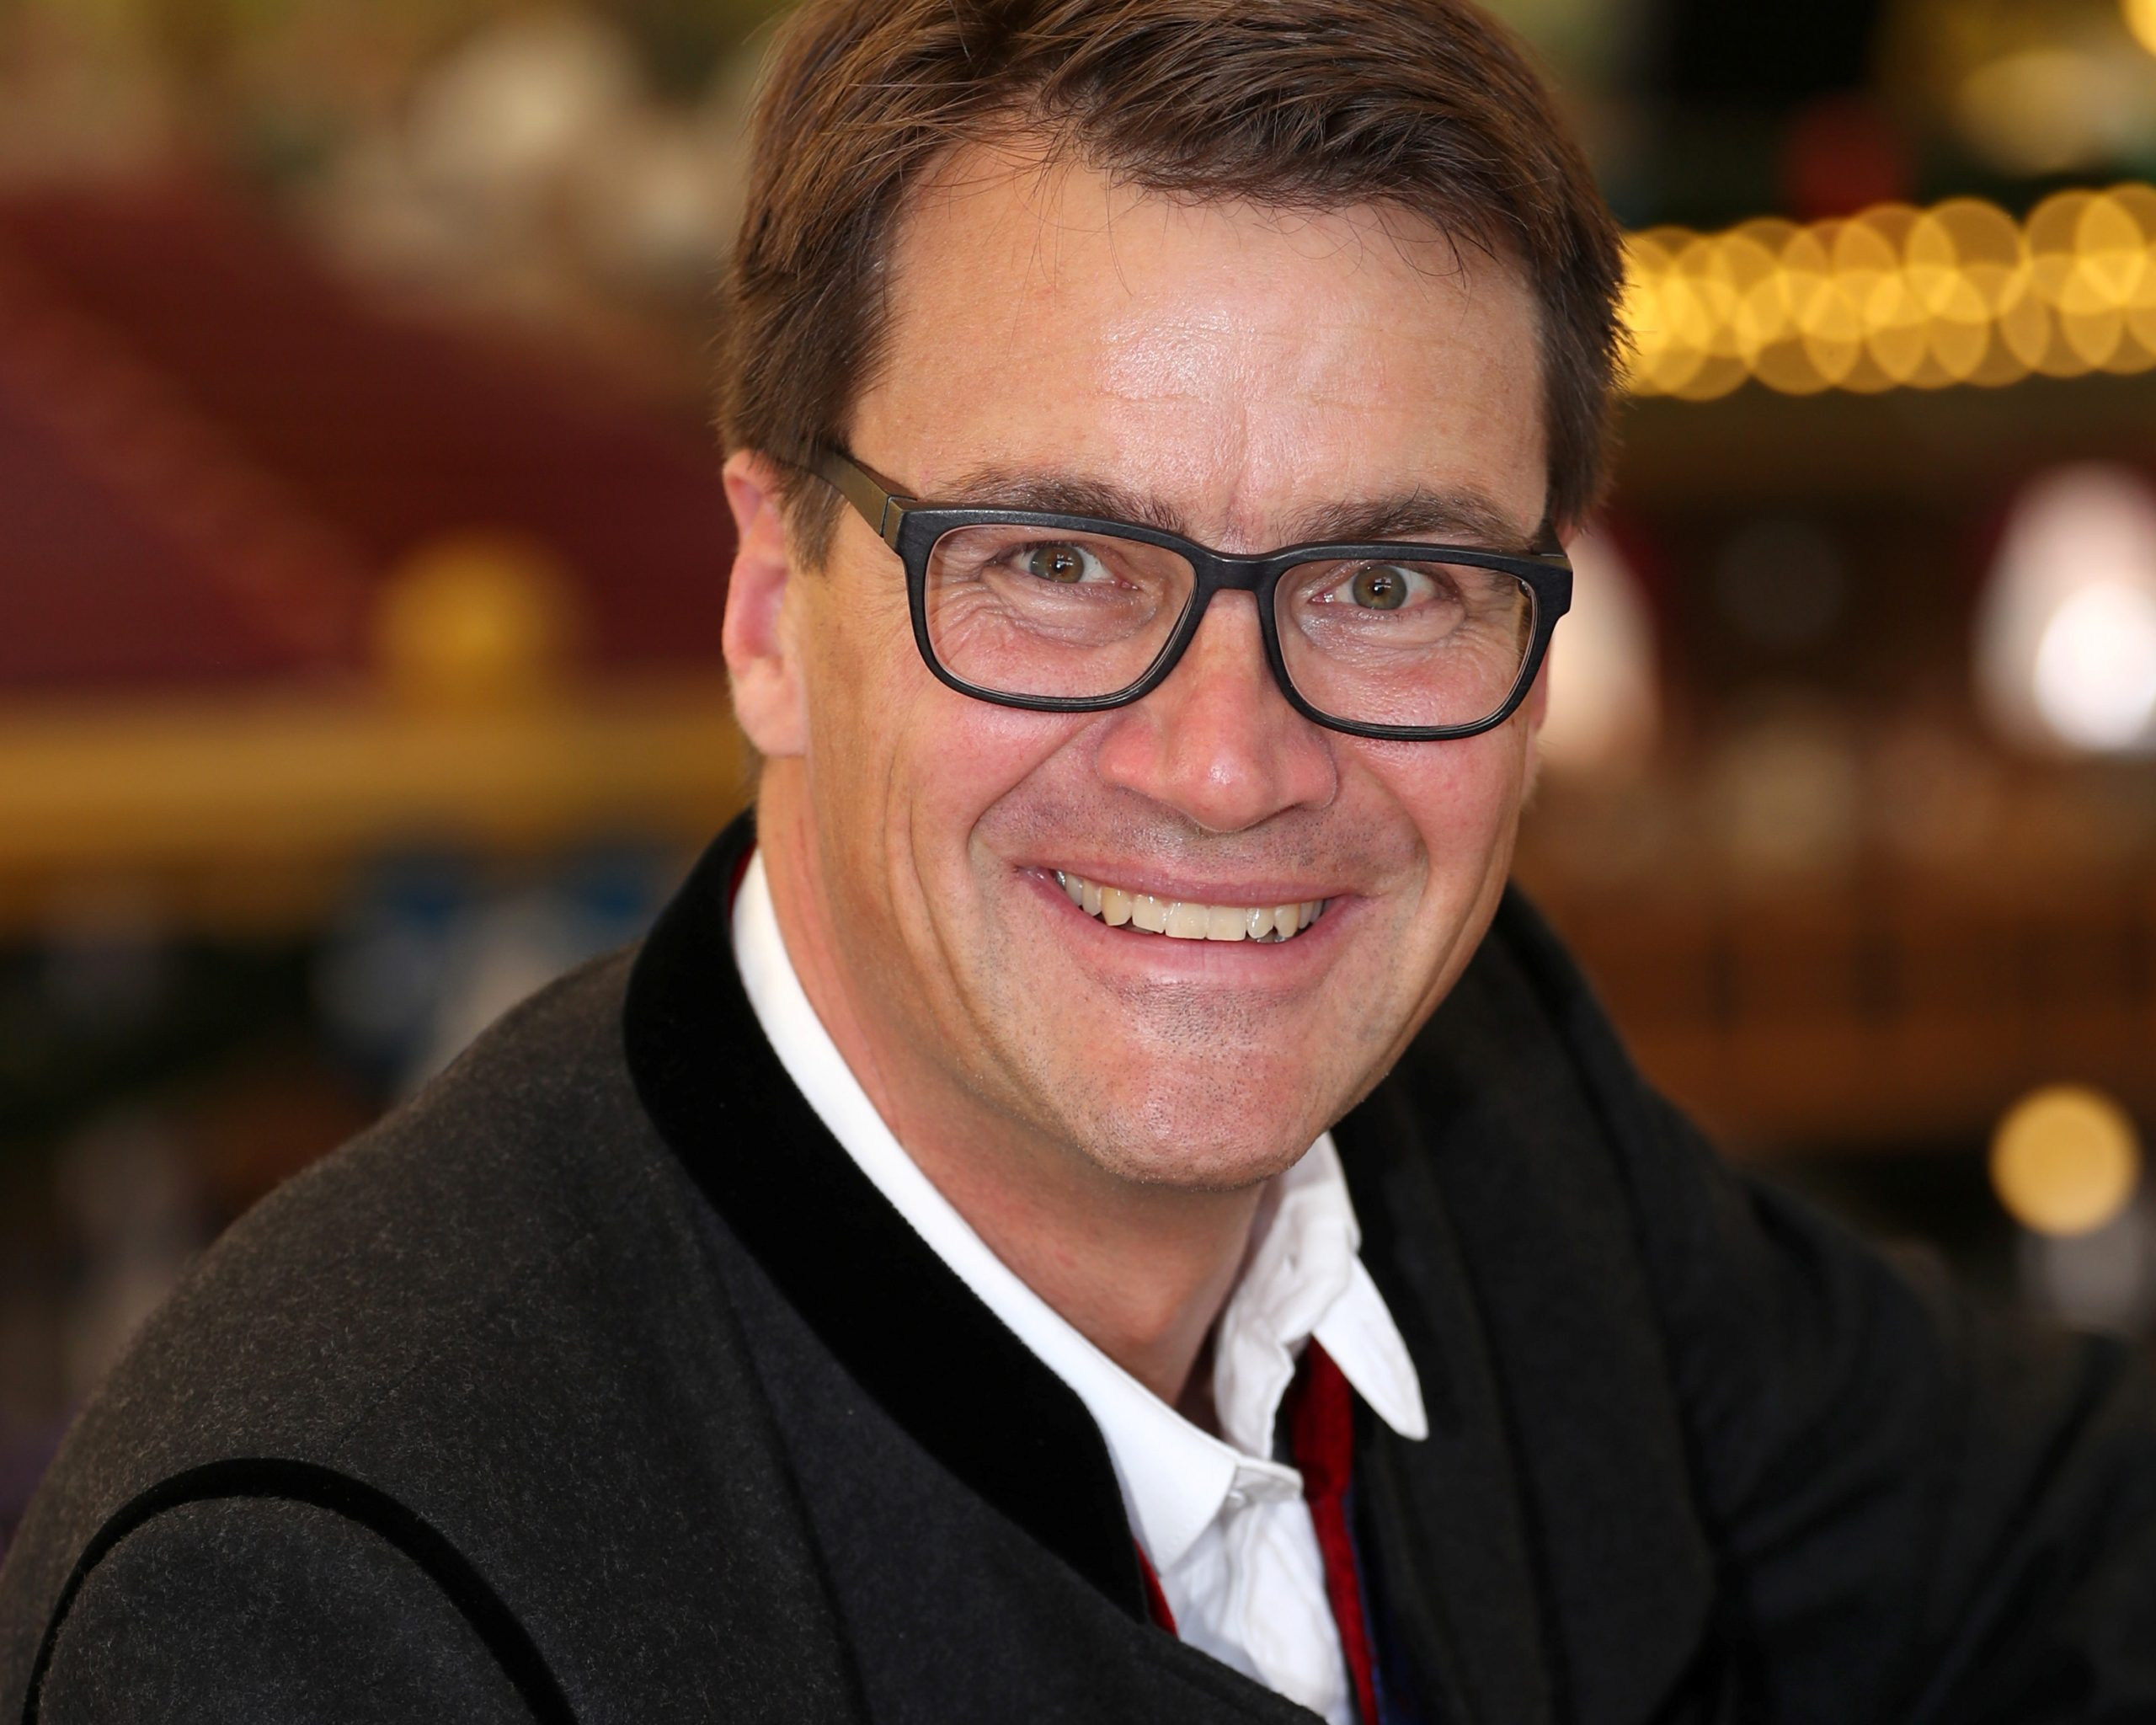 Brauer-Präsident Dr. Jörg Lehmann im Amt bestätigt